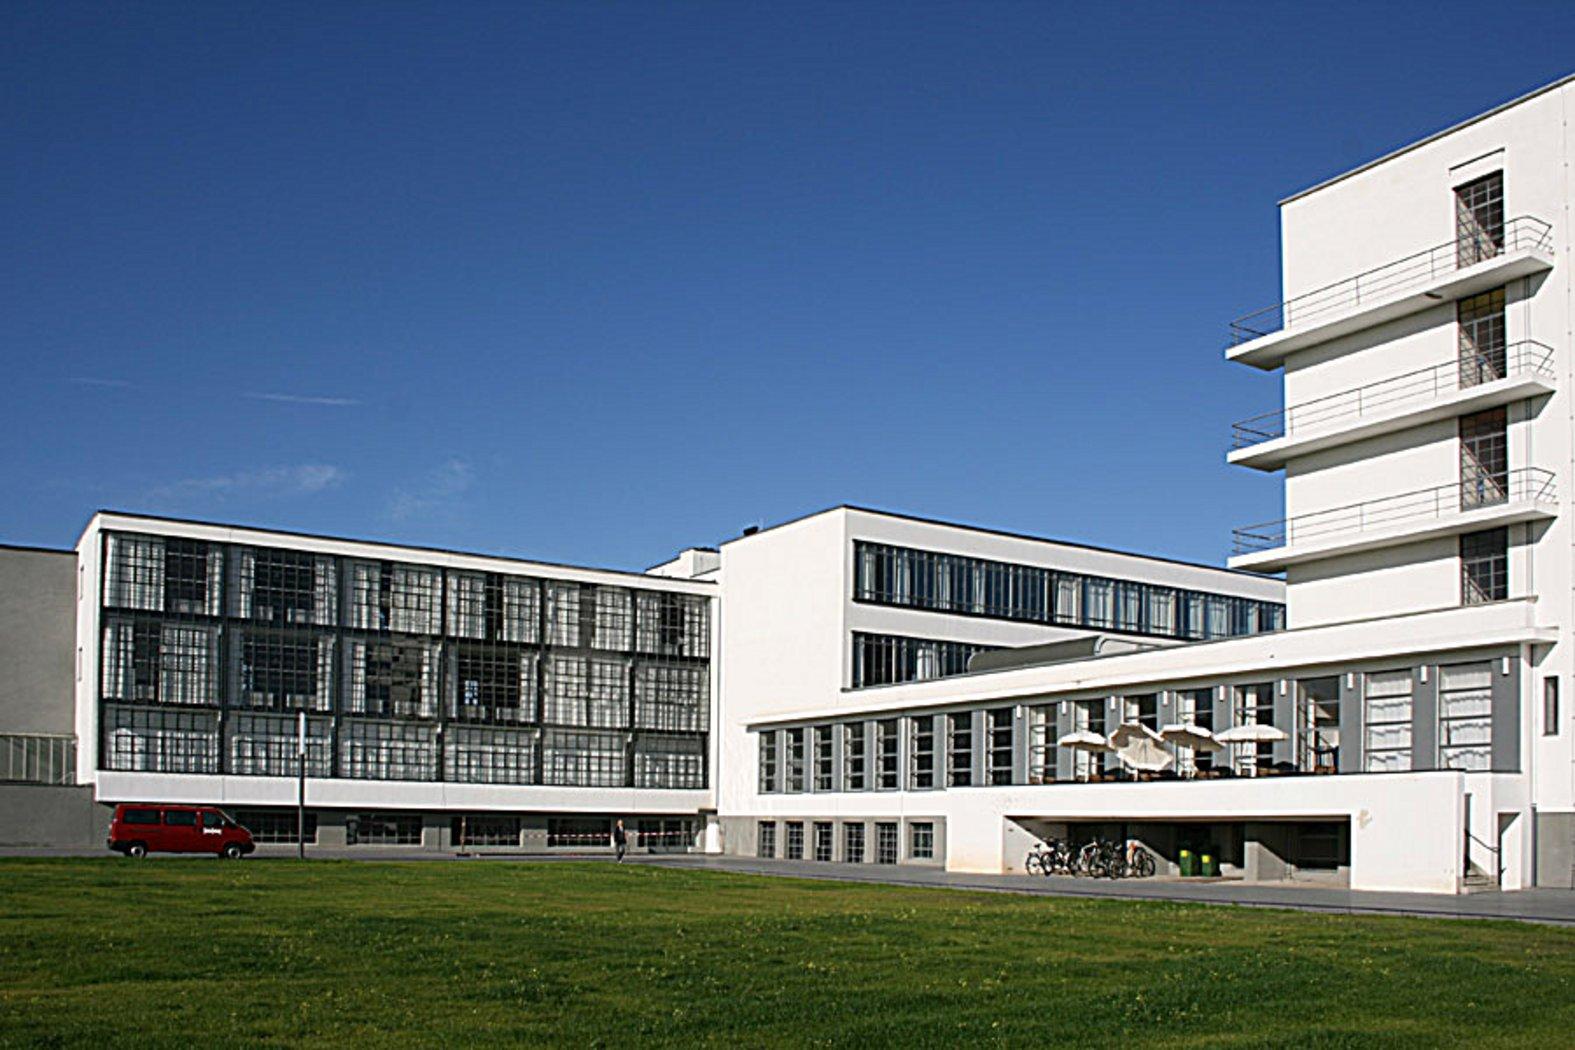 bauhaus building by walter gropius 1925 26 bauhaus building